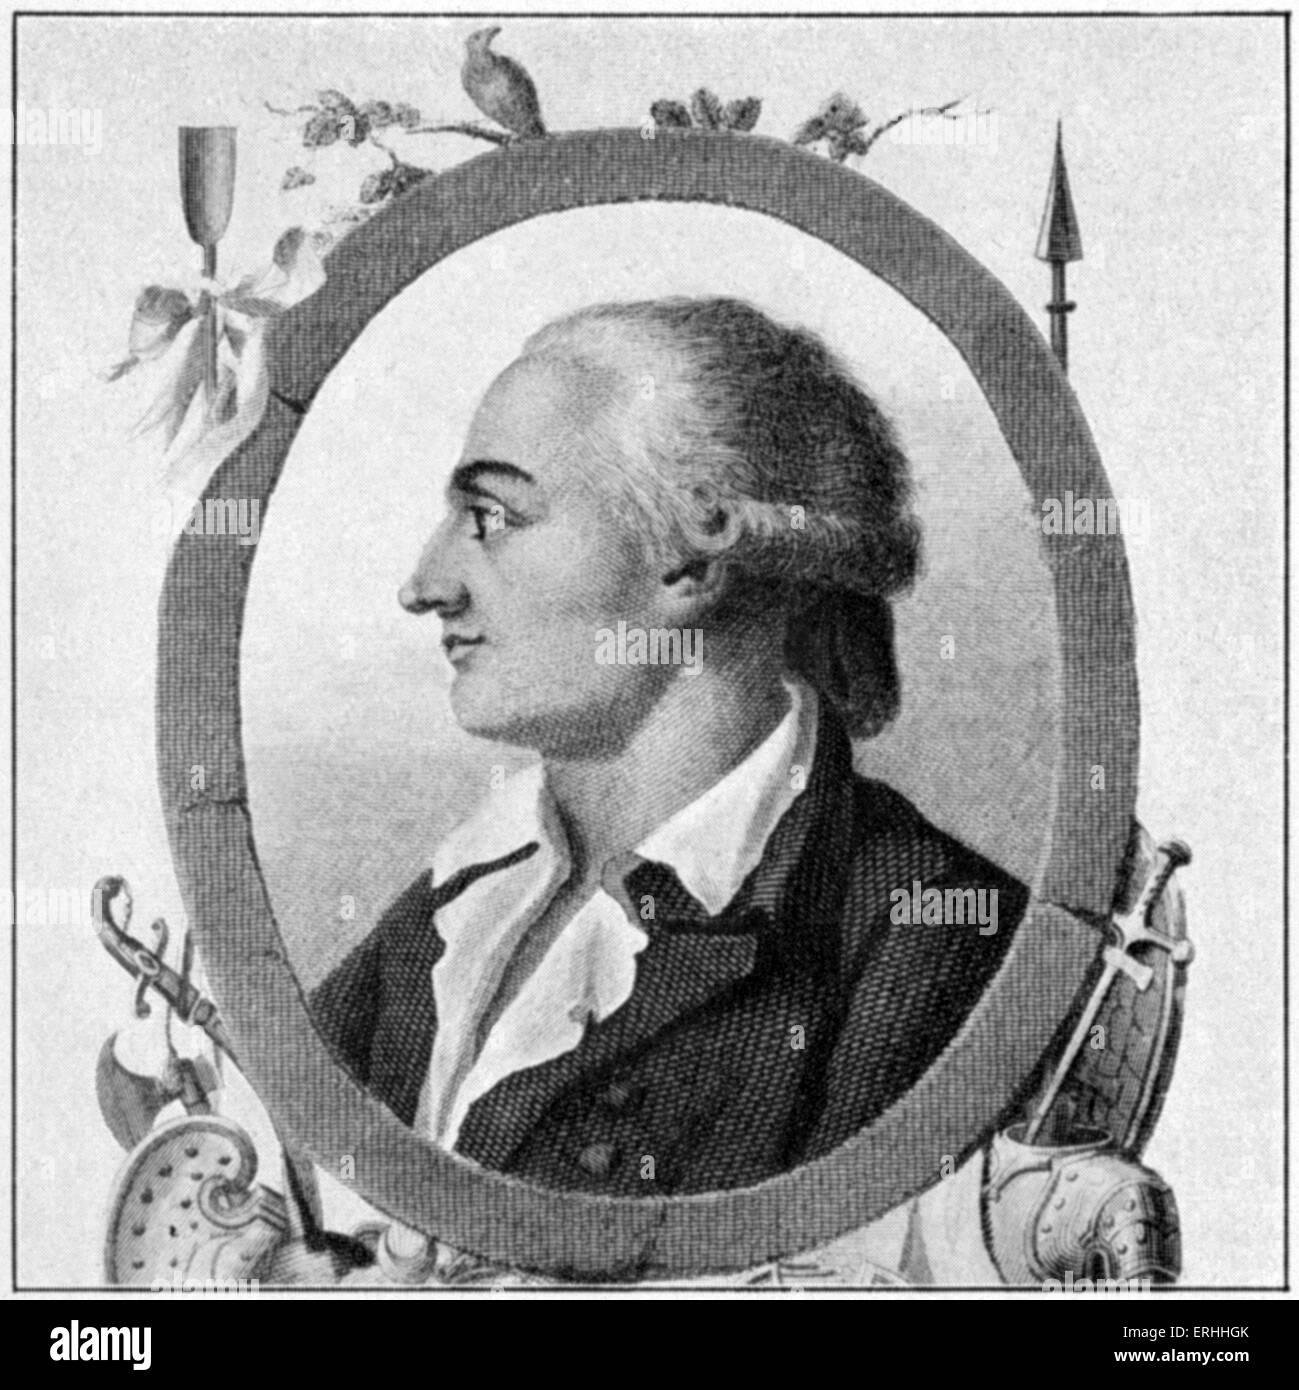 (Jean-Pierre Claris de) Florian - profile portrait of the French author. 6 March 1755 - 12 September 1794.  Engraving - Stock Image